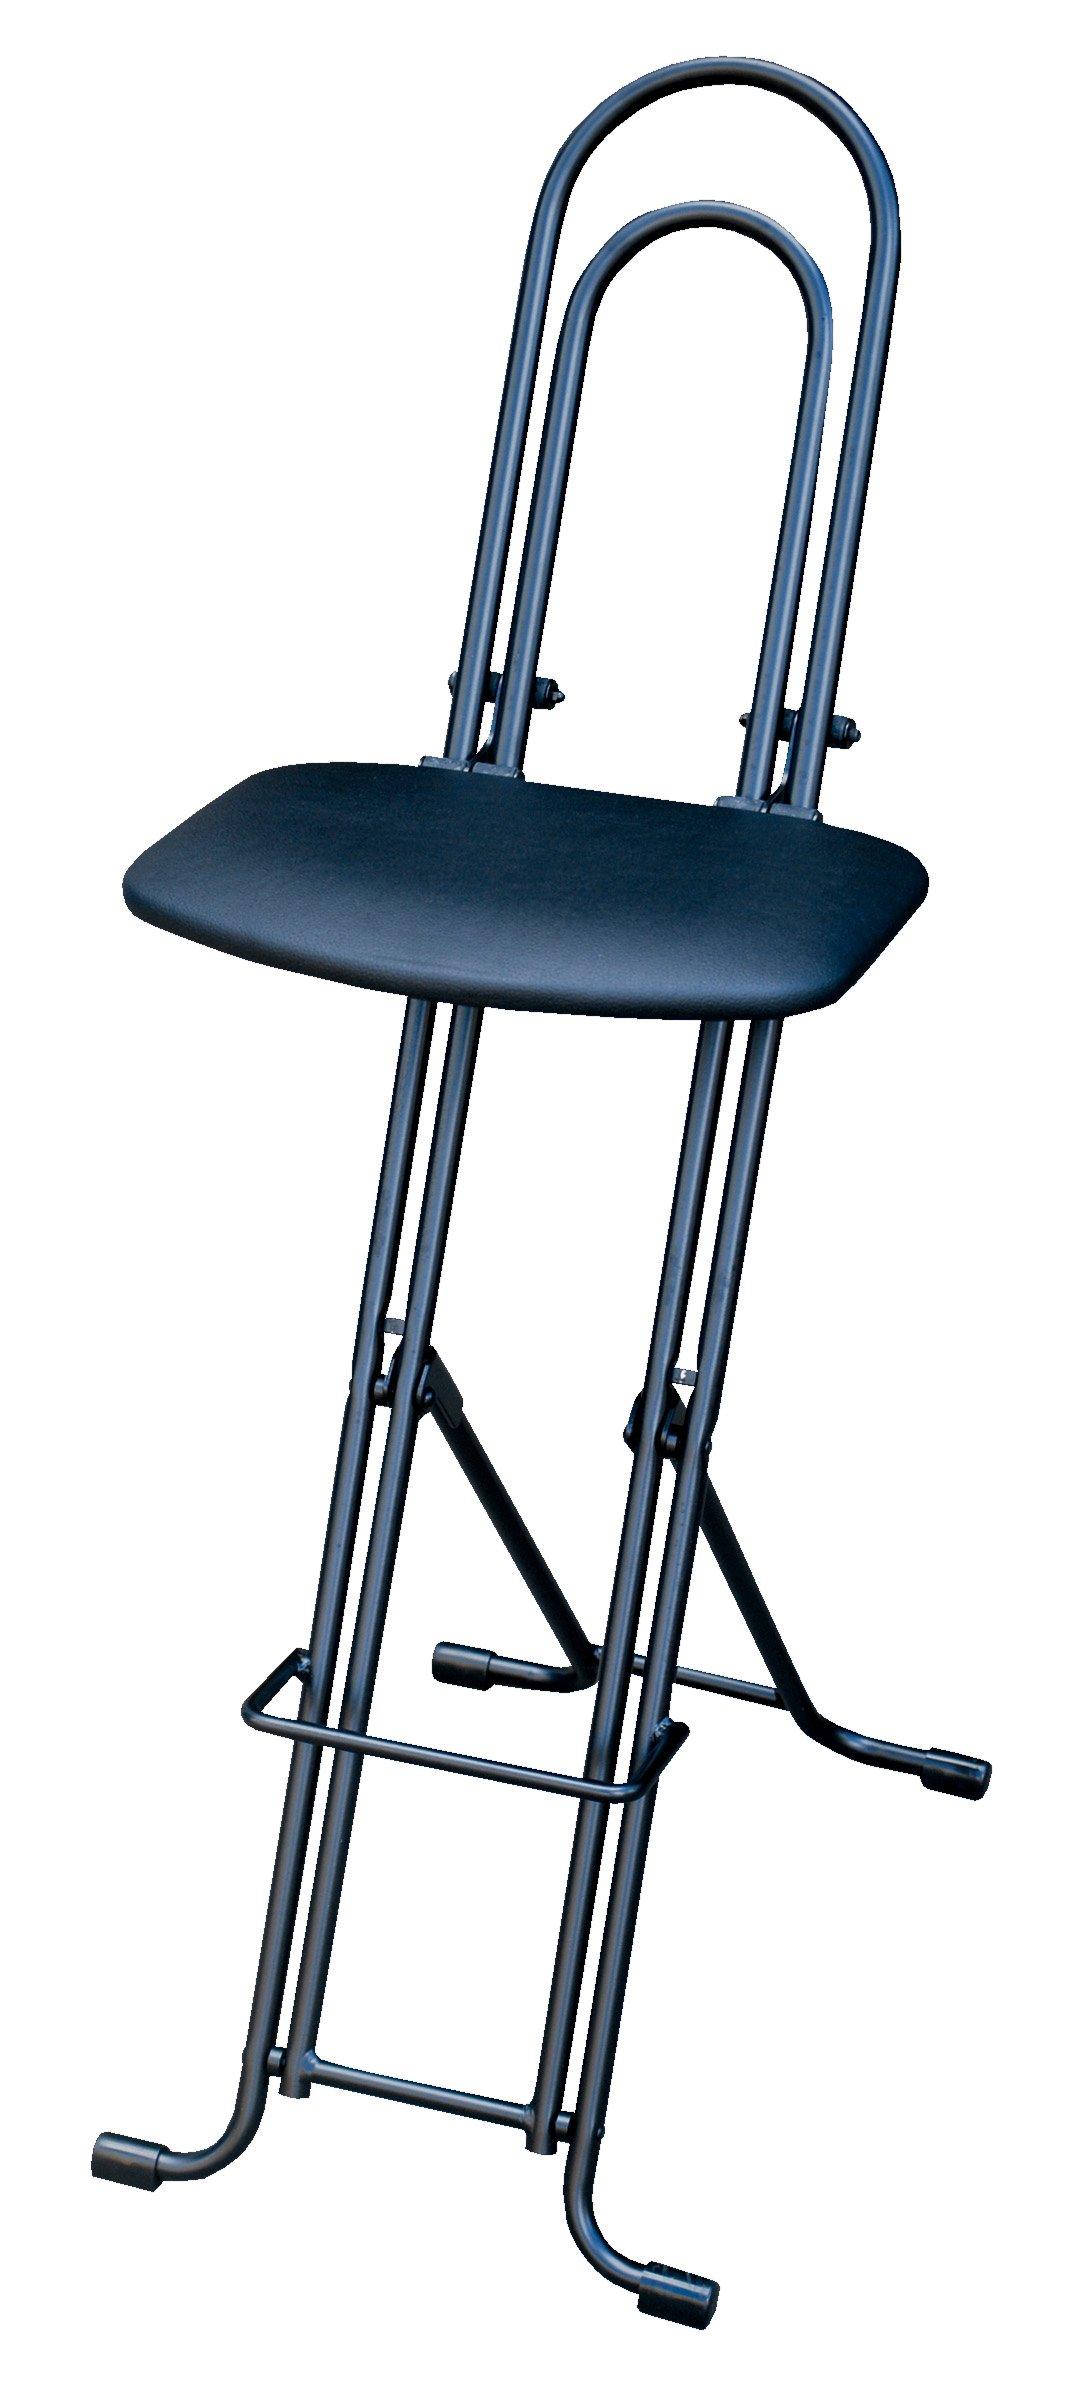 Vestil CPRO-800LP Ergonomic Worker Seat/Chair, 13-1/2'' Width, 10'' Depth, 300 lb. Capacity, 18'' - 33'' Height Range by Vestil (Image #3)